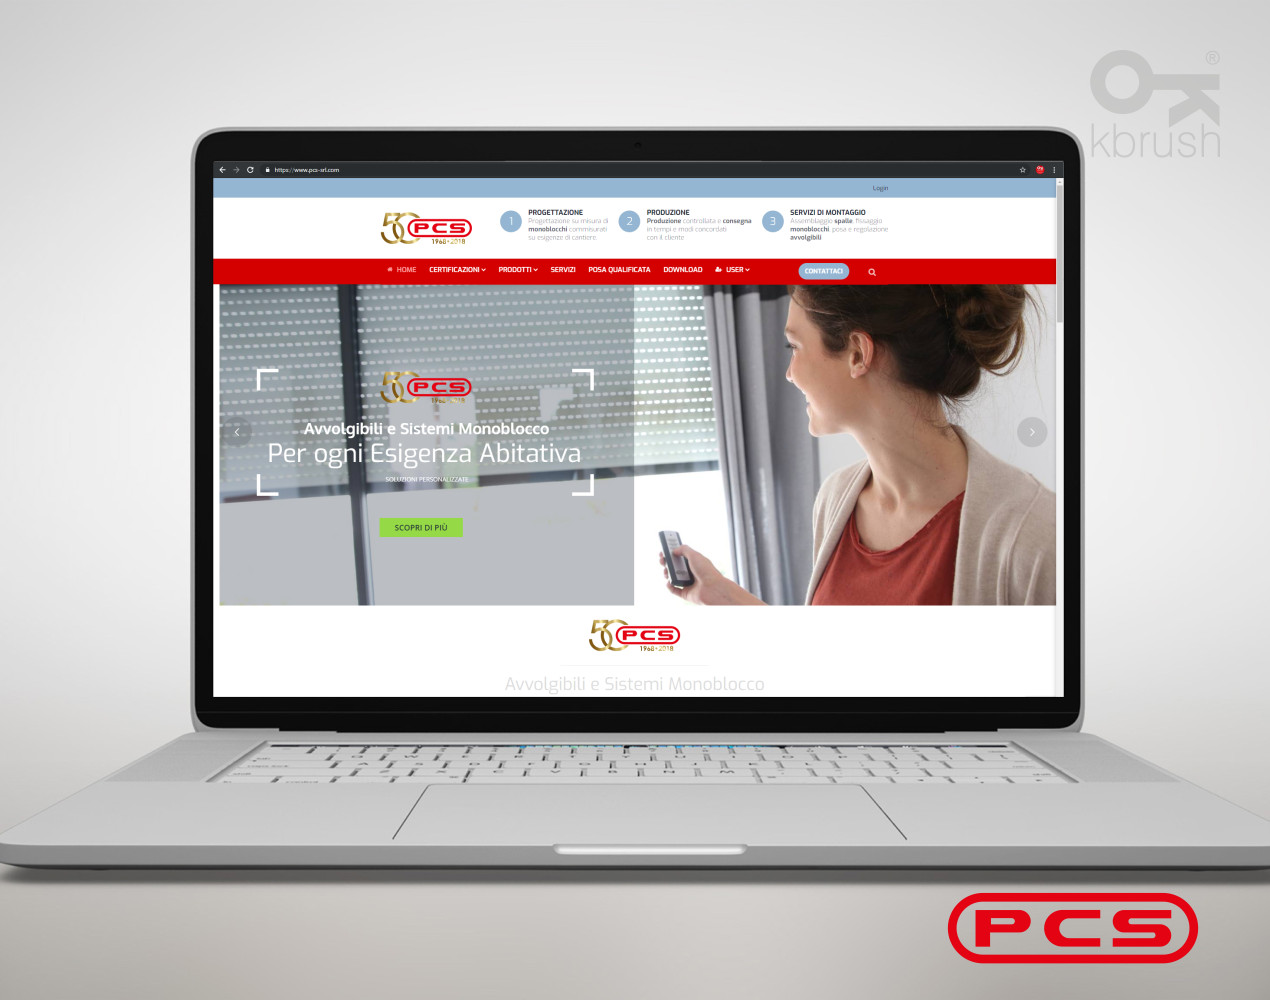 sito web PCS – Kbrush Studio grafico